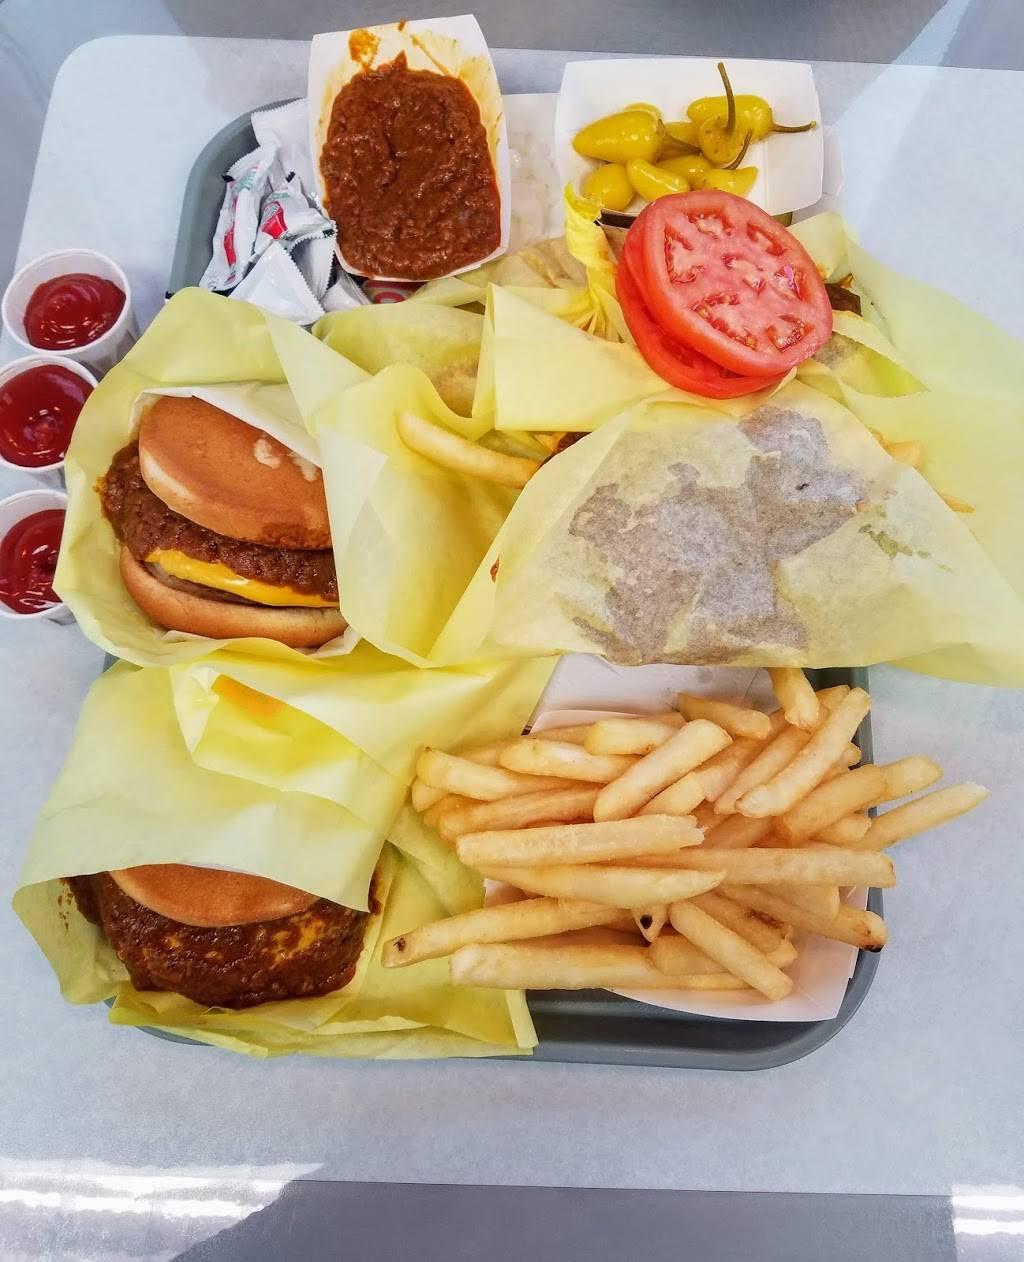 Original Tommys | restaurant | 9309 Central Ave, Montclair, CA 91763, USA | 9099713321 OR +1 909-971-3321